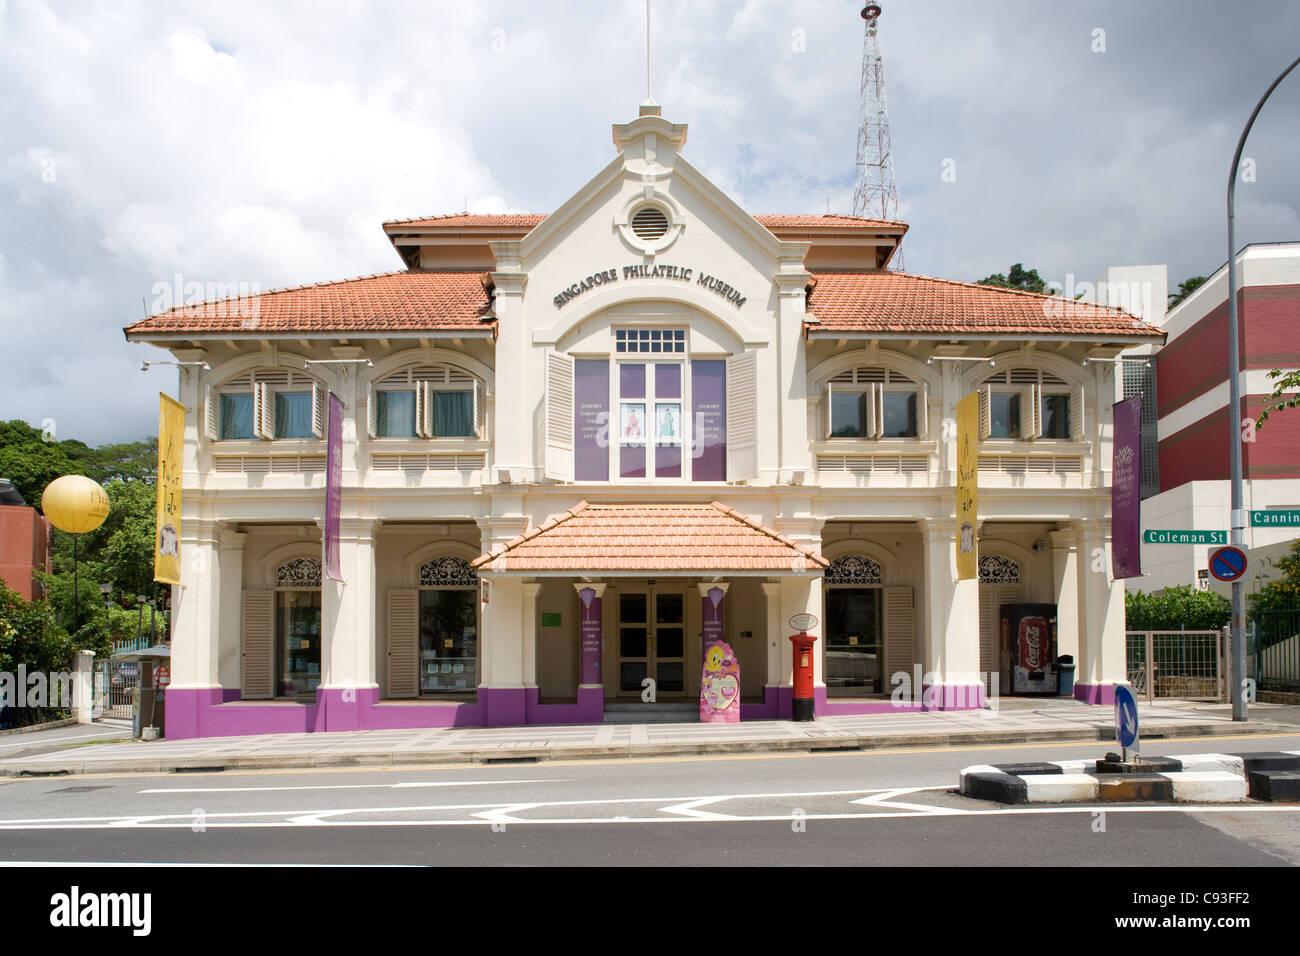 Singapore Philatelic Museum - Stock Image